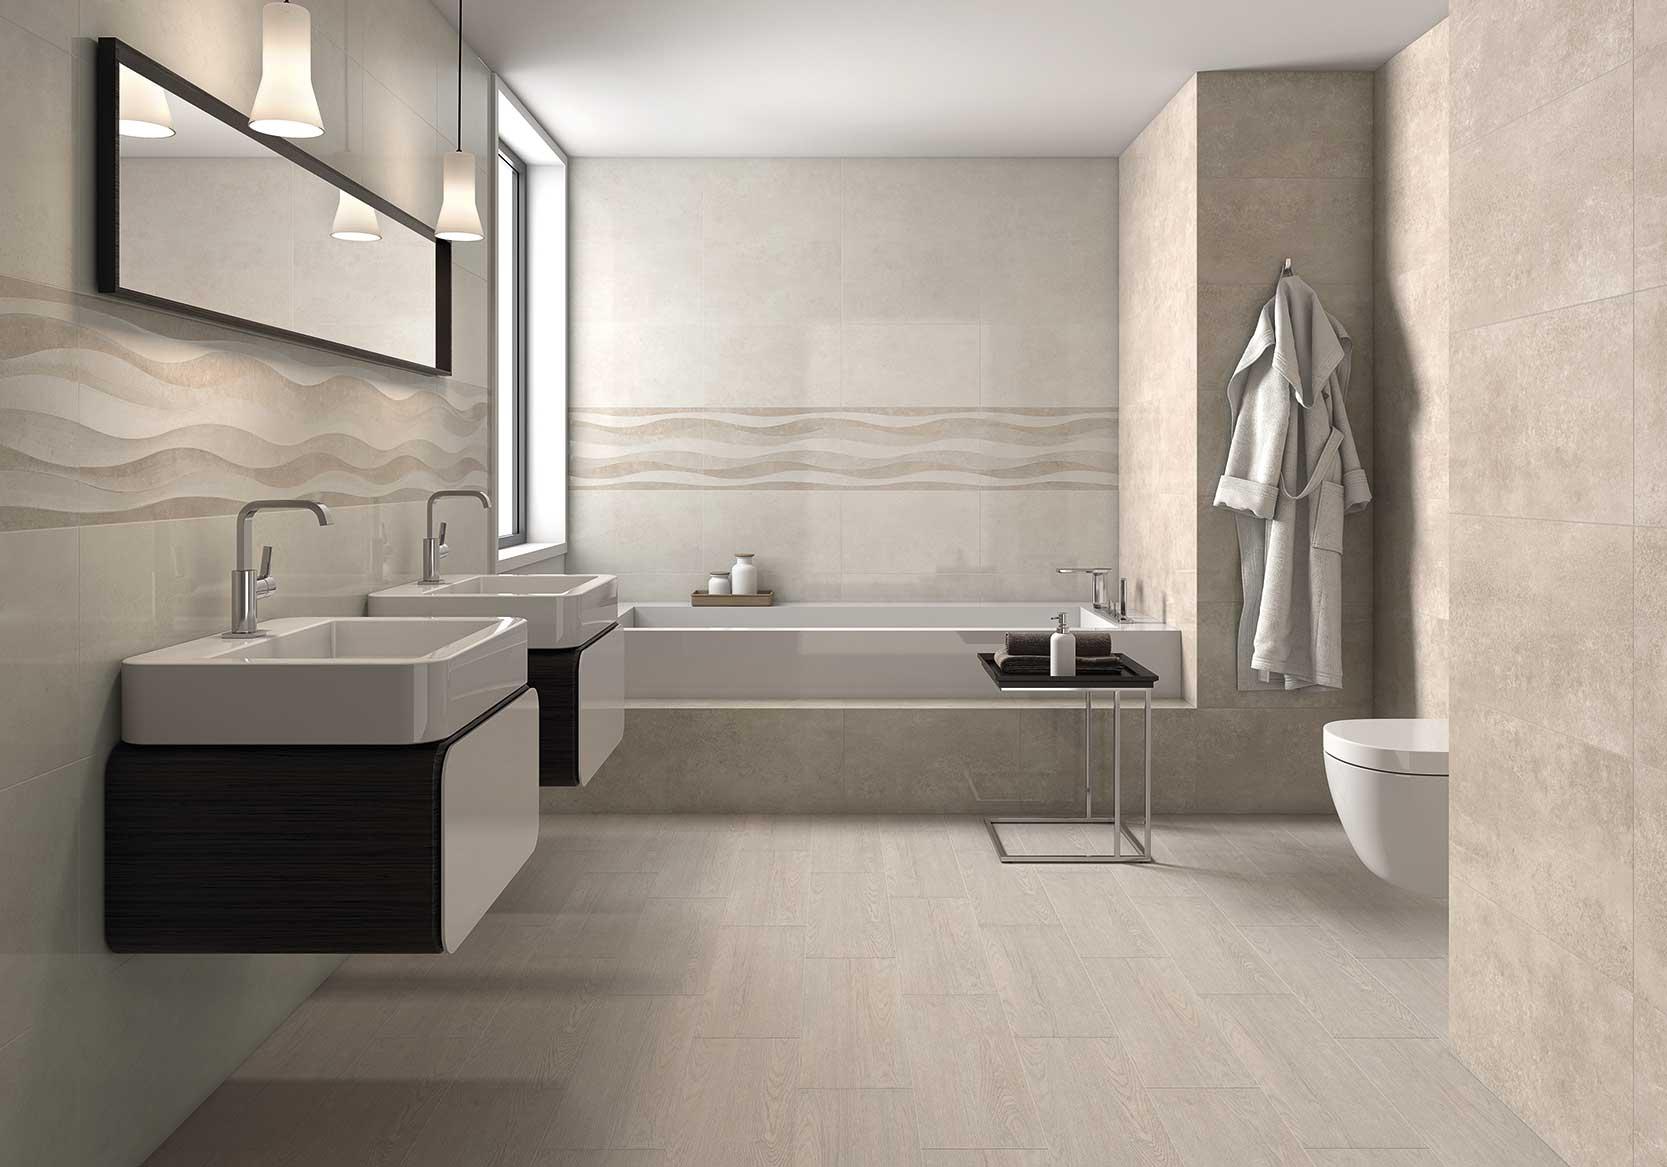 Serie 33 55 delhi azulejos y pavimentos mart n for Azulejos y pavimentos san juan